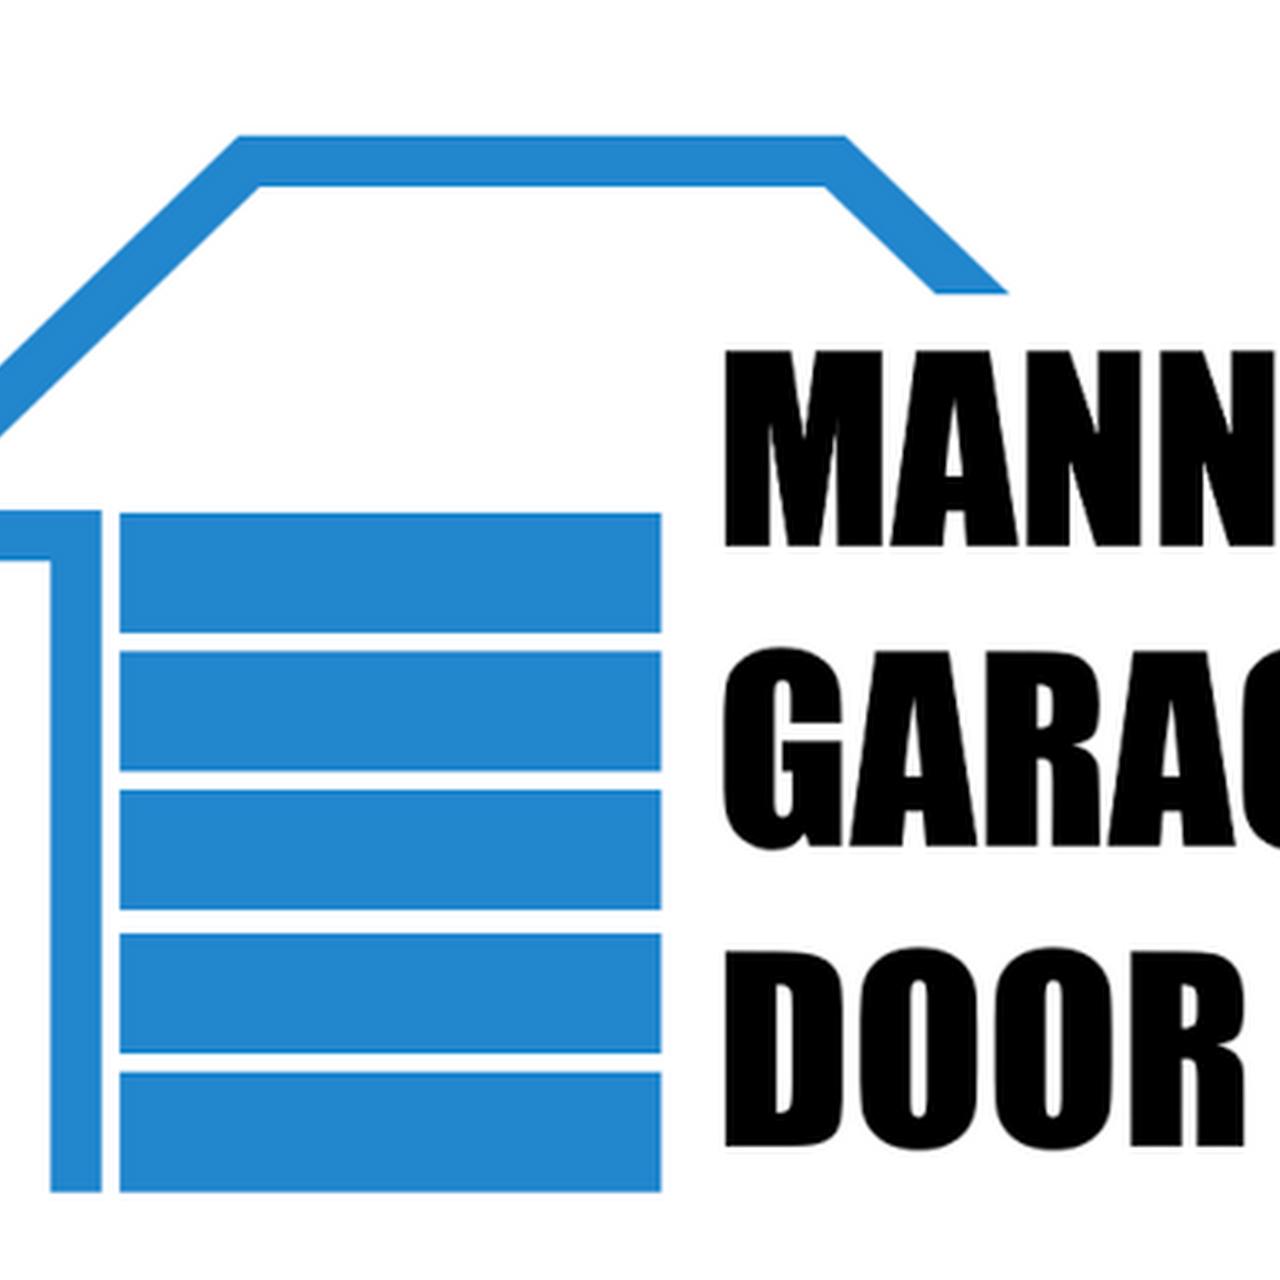 Hurricane Master Garage Doors World S Strongest Home